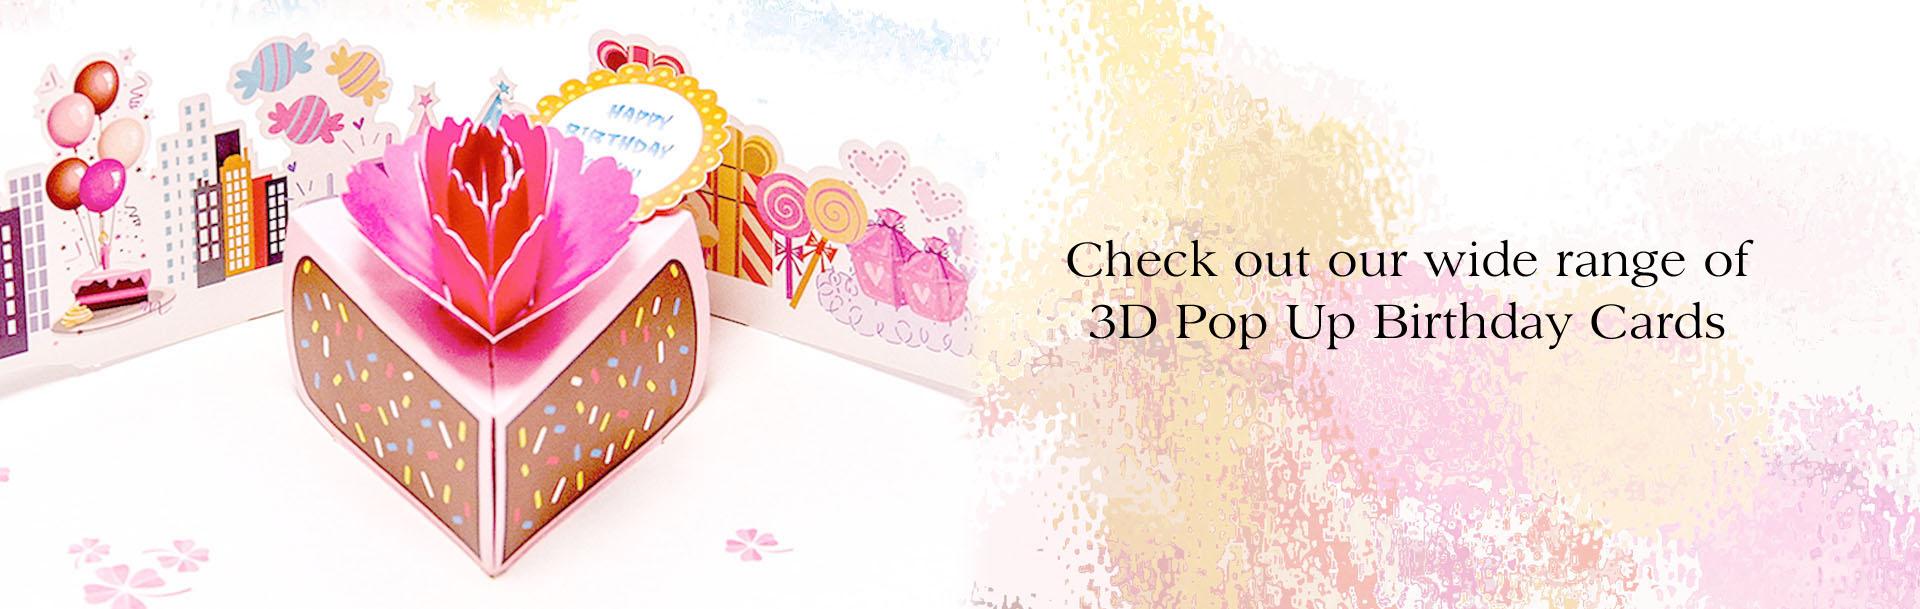 3D Pop Up Birthday Cards